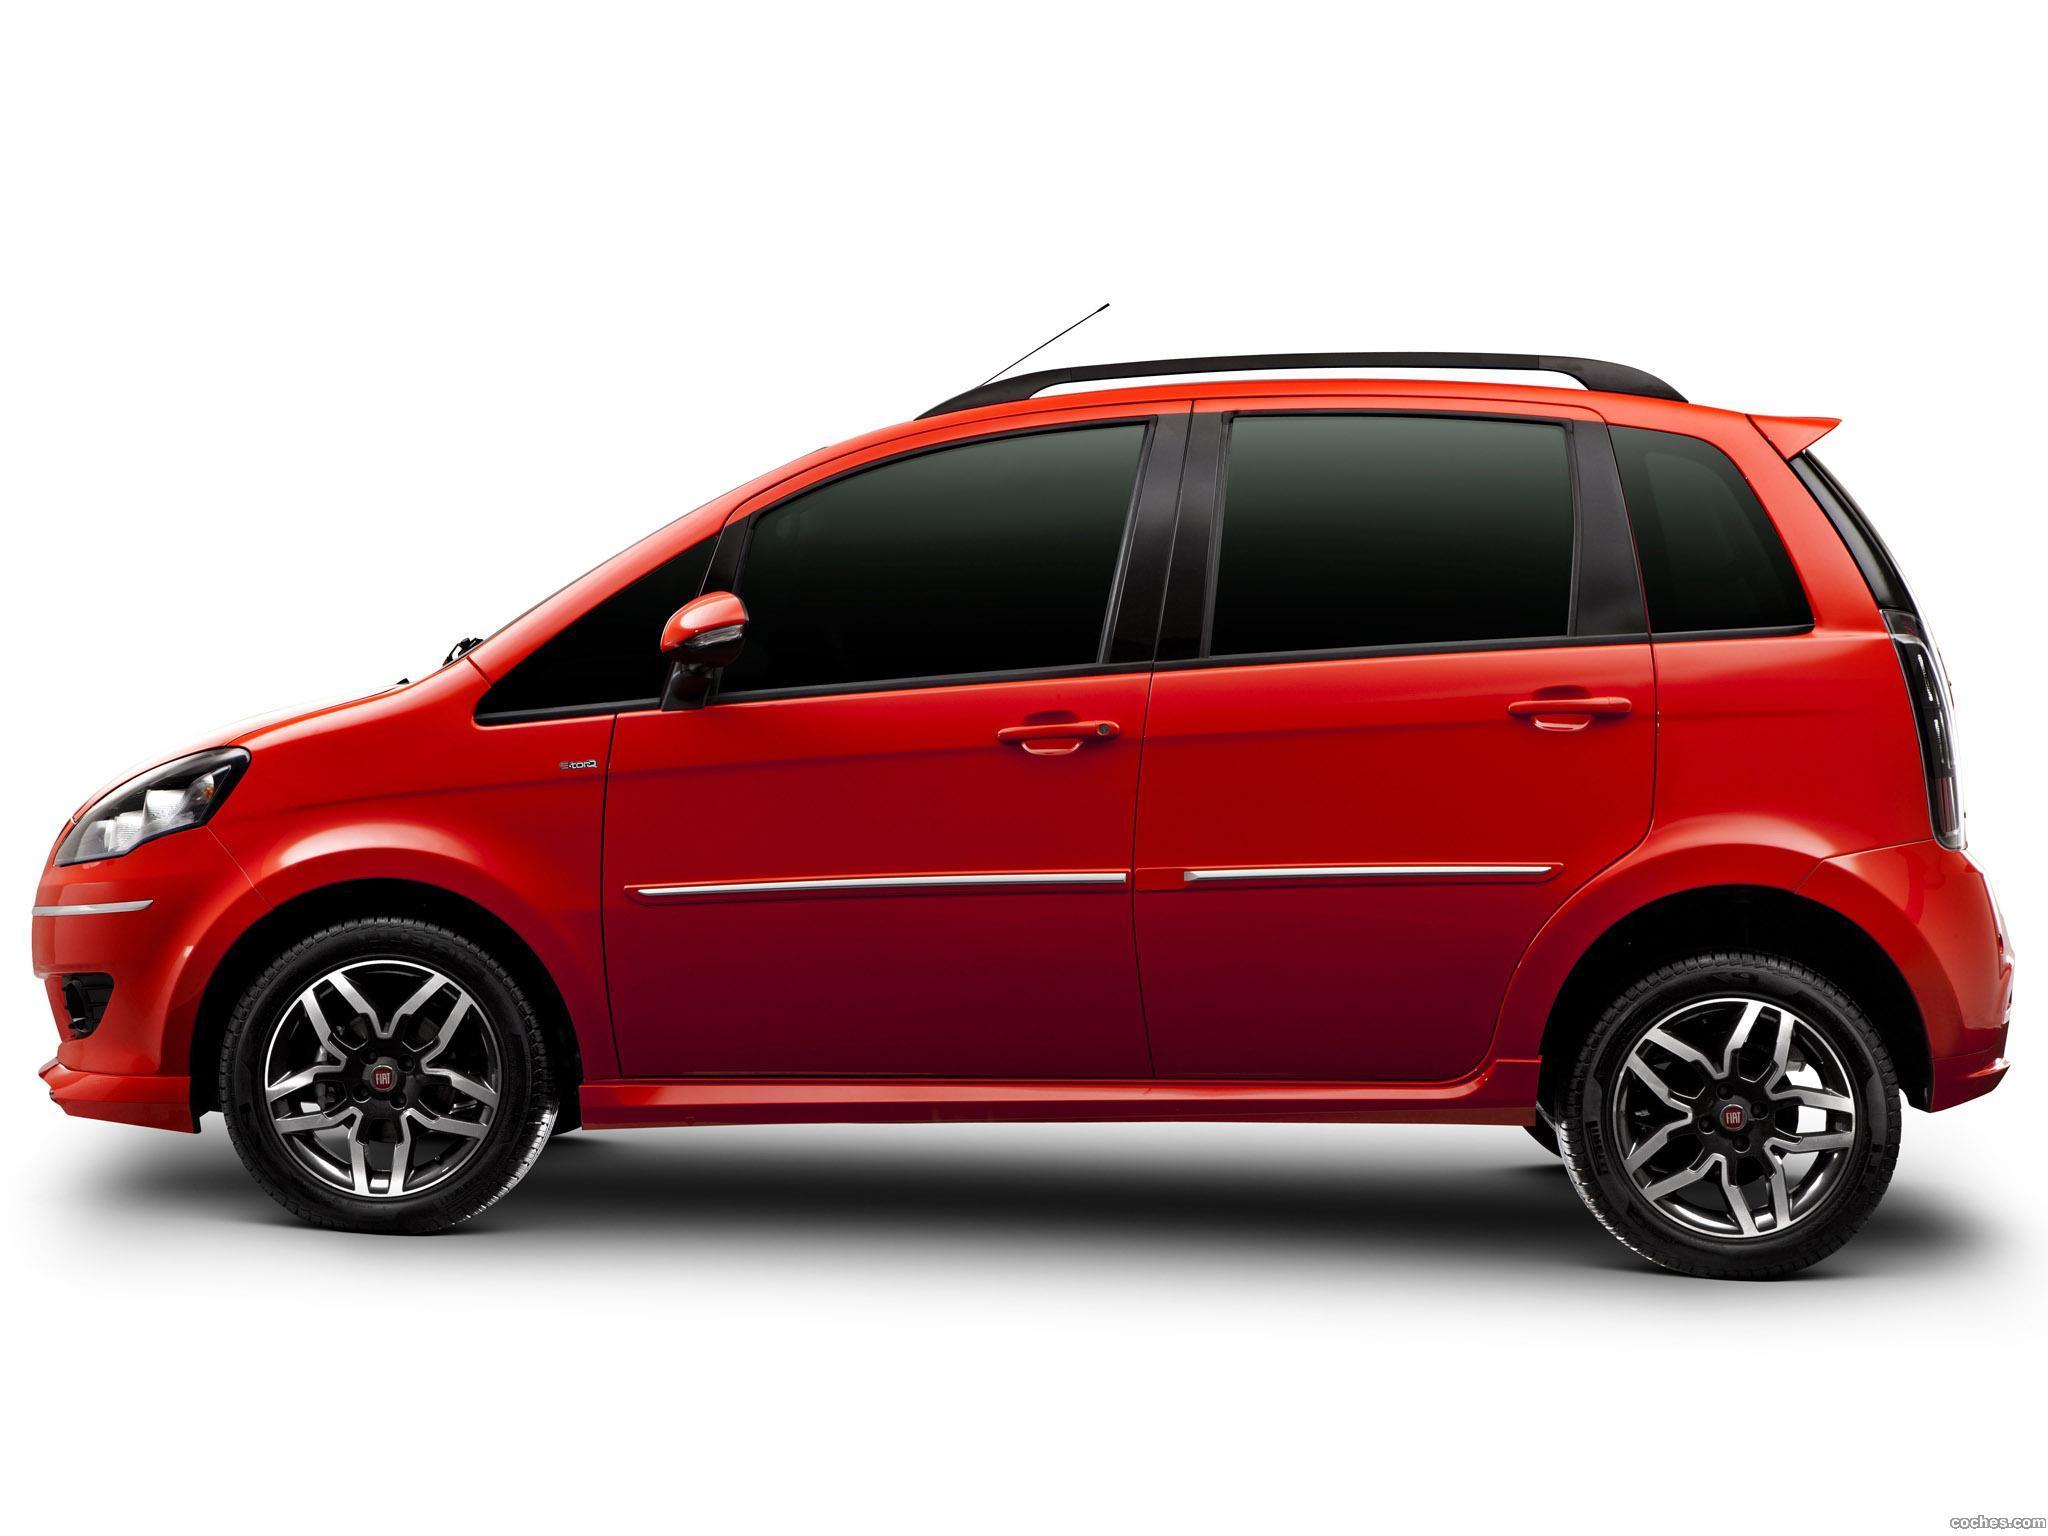 Foto 10 de Fiat Idea Sporting 2010